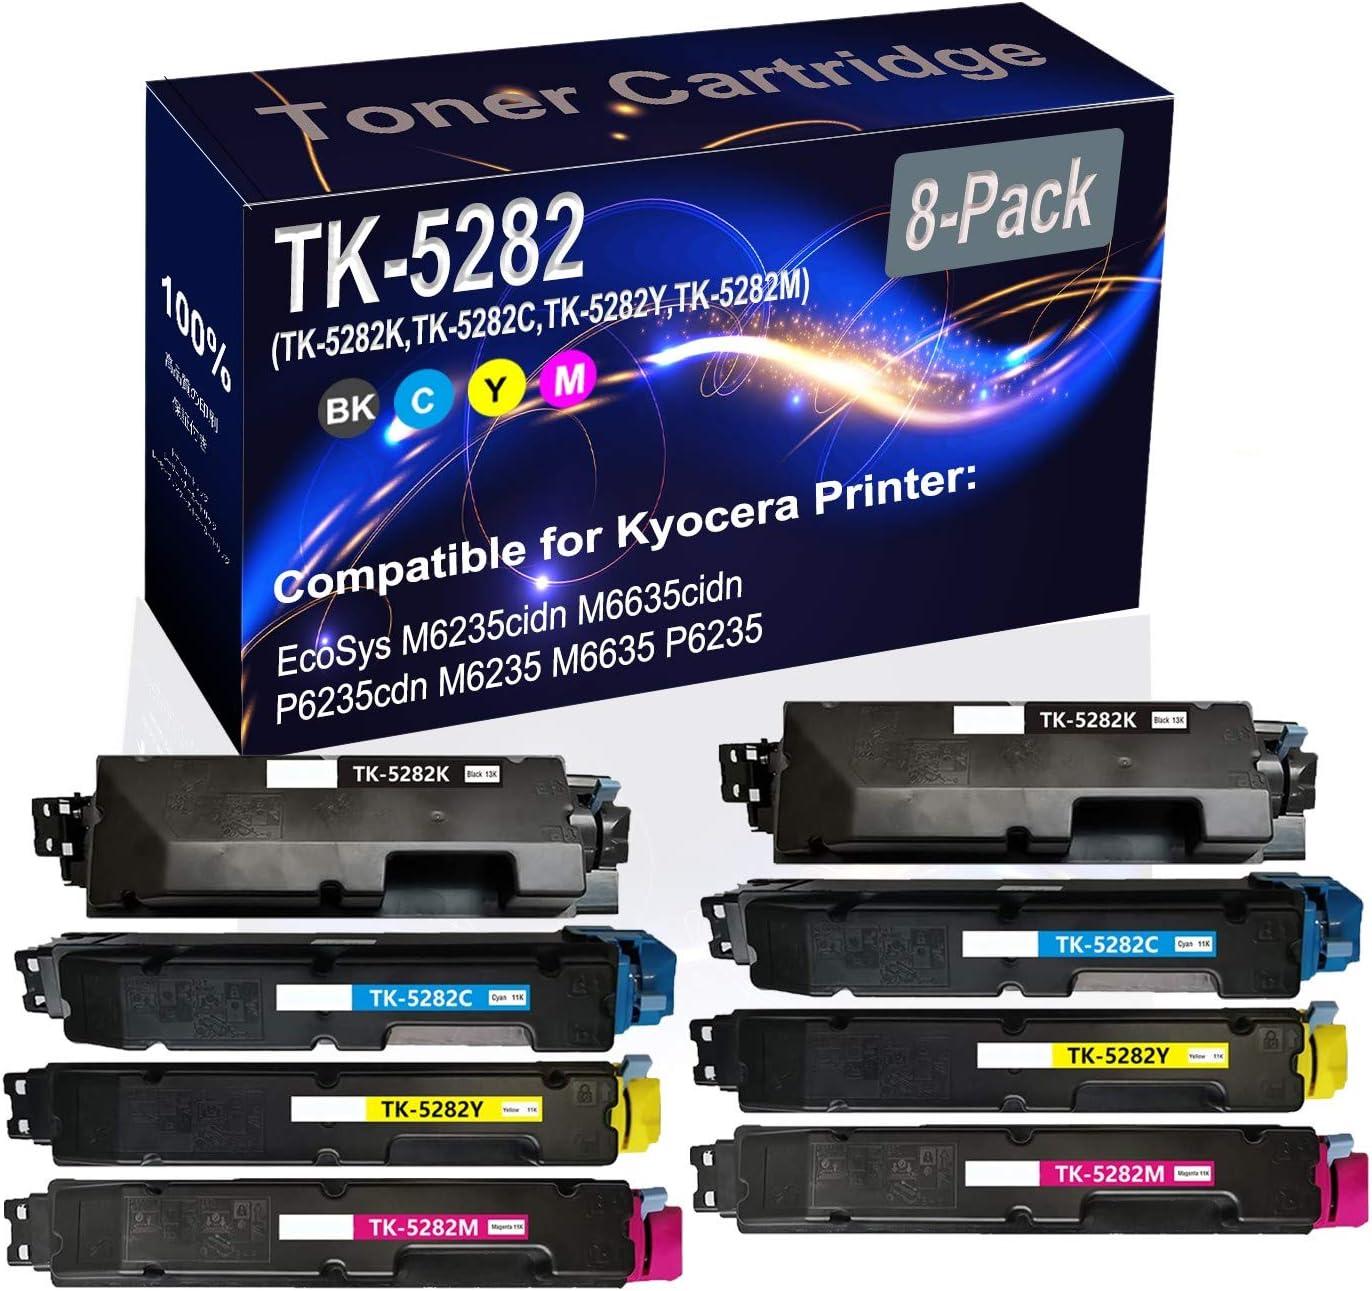 8-Pack 2BK+2C+2Y+2M Max 74% OFF Compatible EcoSys Save money Toner Ca M6235cidn Laser